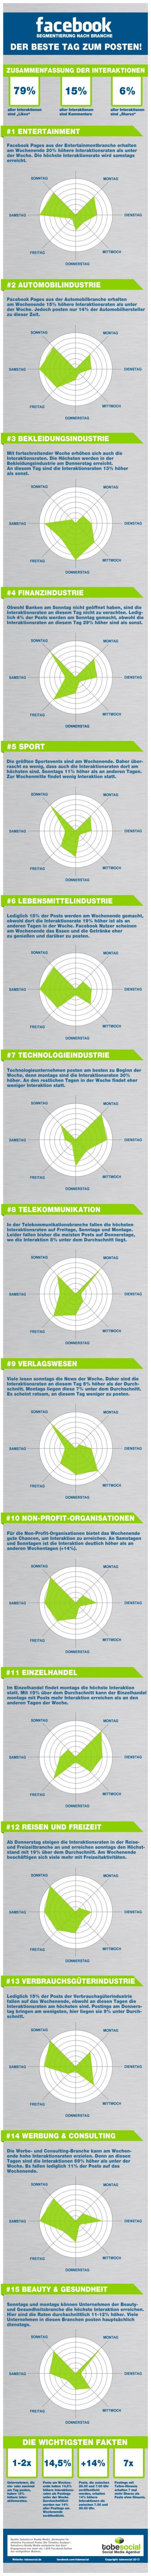 Infografik-facebook-posting-strategie-nach-branchen-social-media-agentur-tobesocial